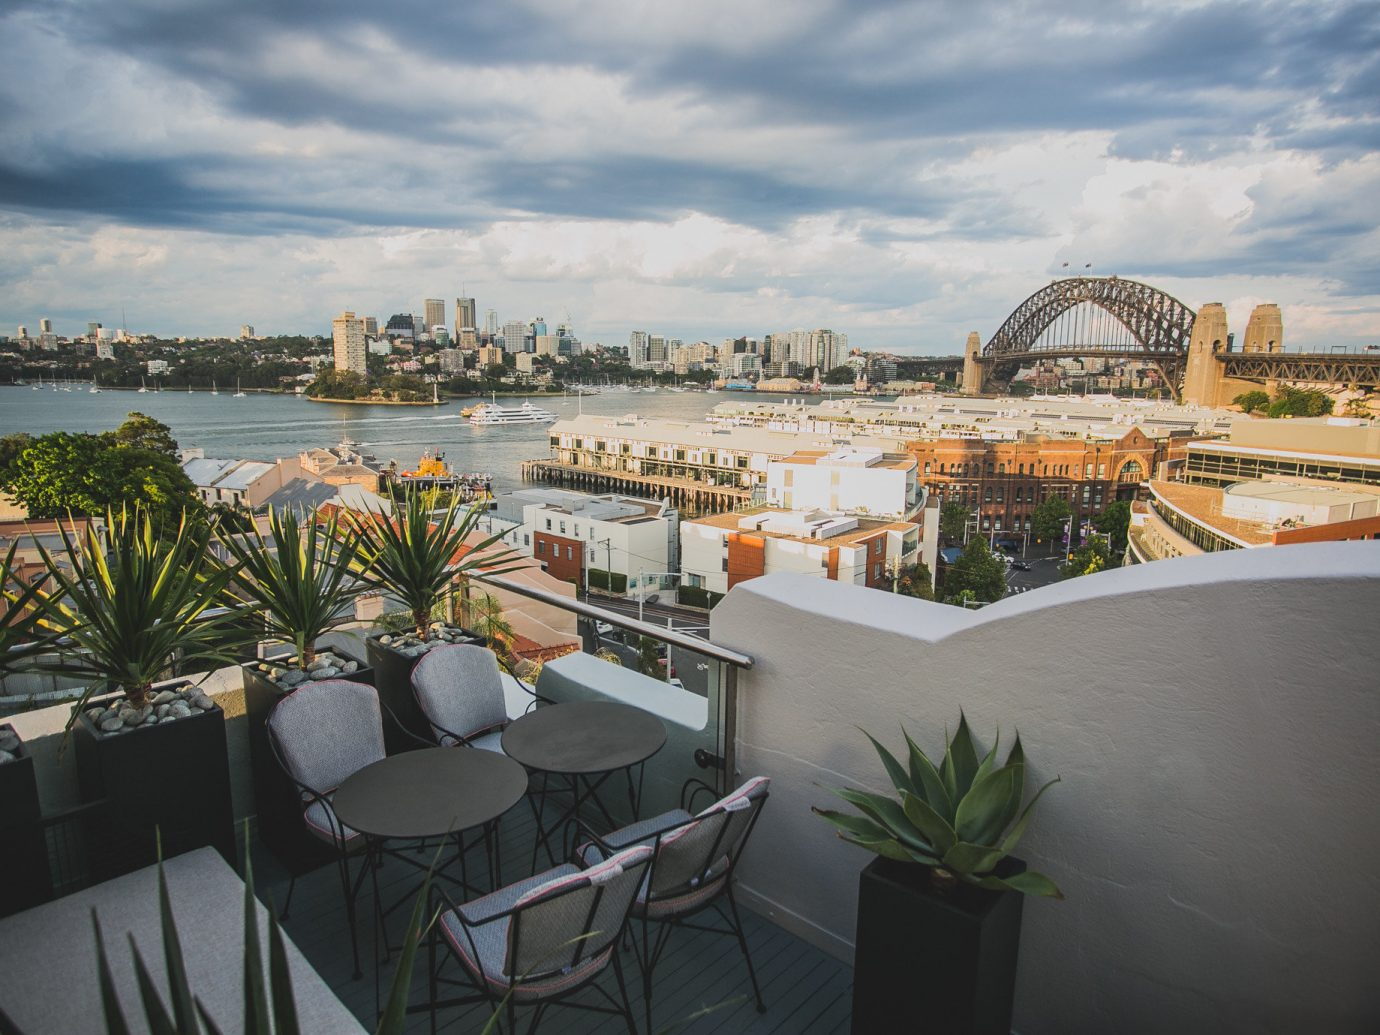 Hotels sky outdoor vacation estate Resort